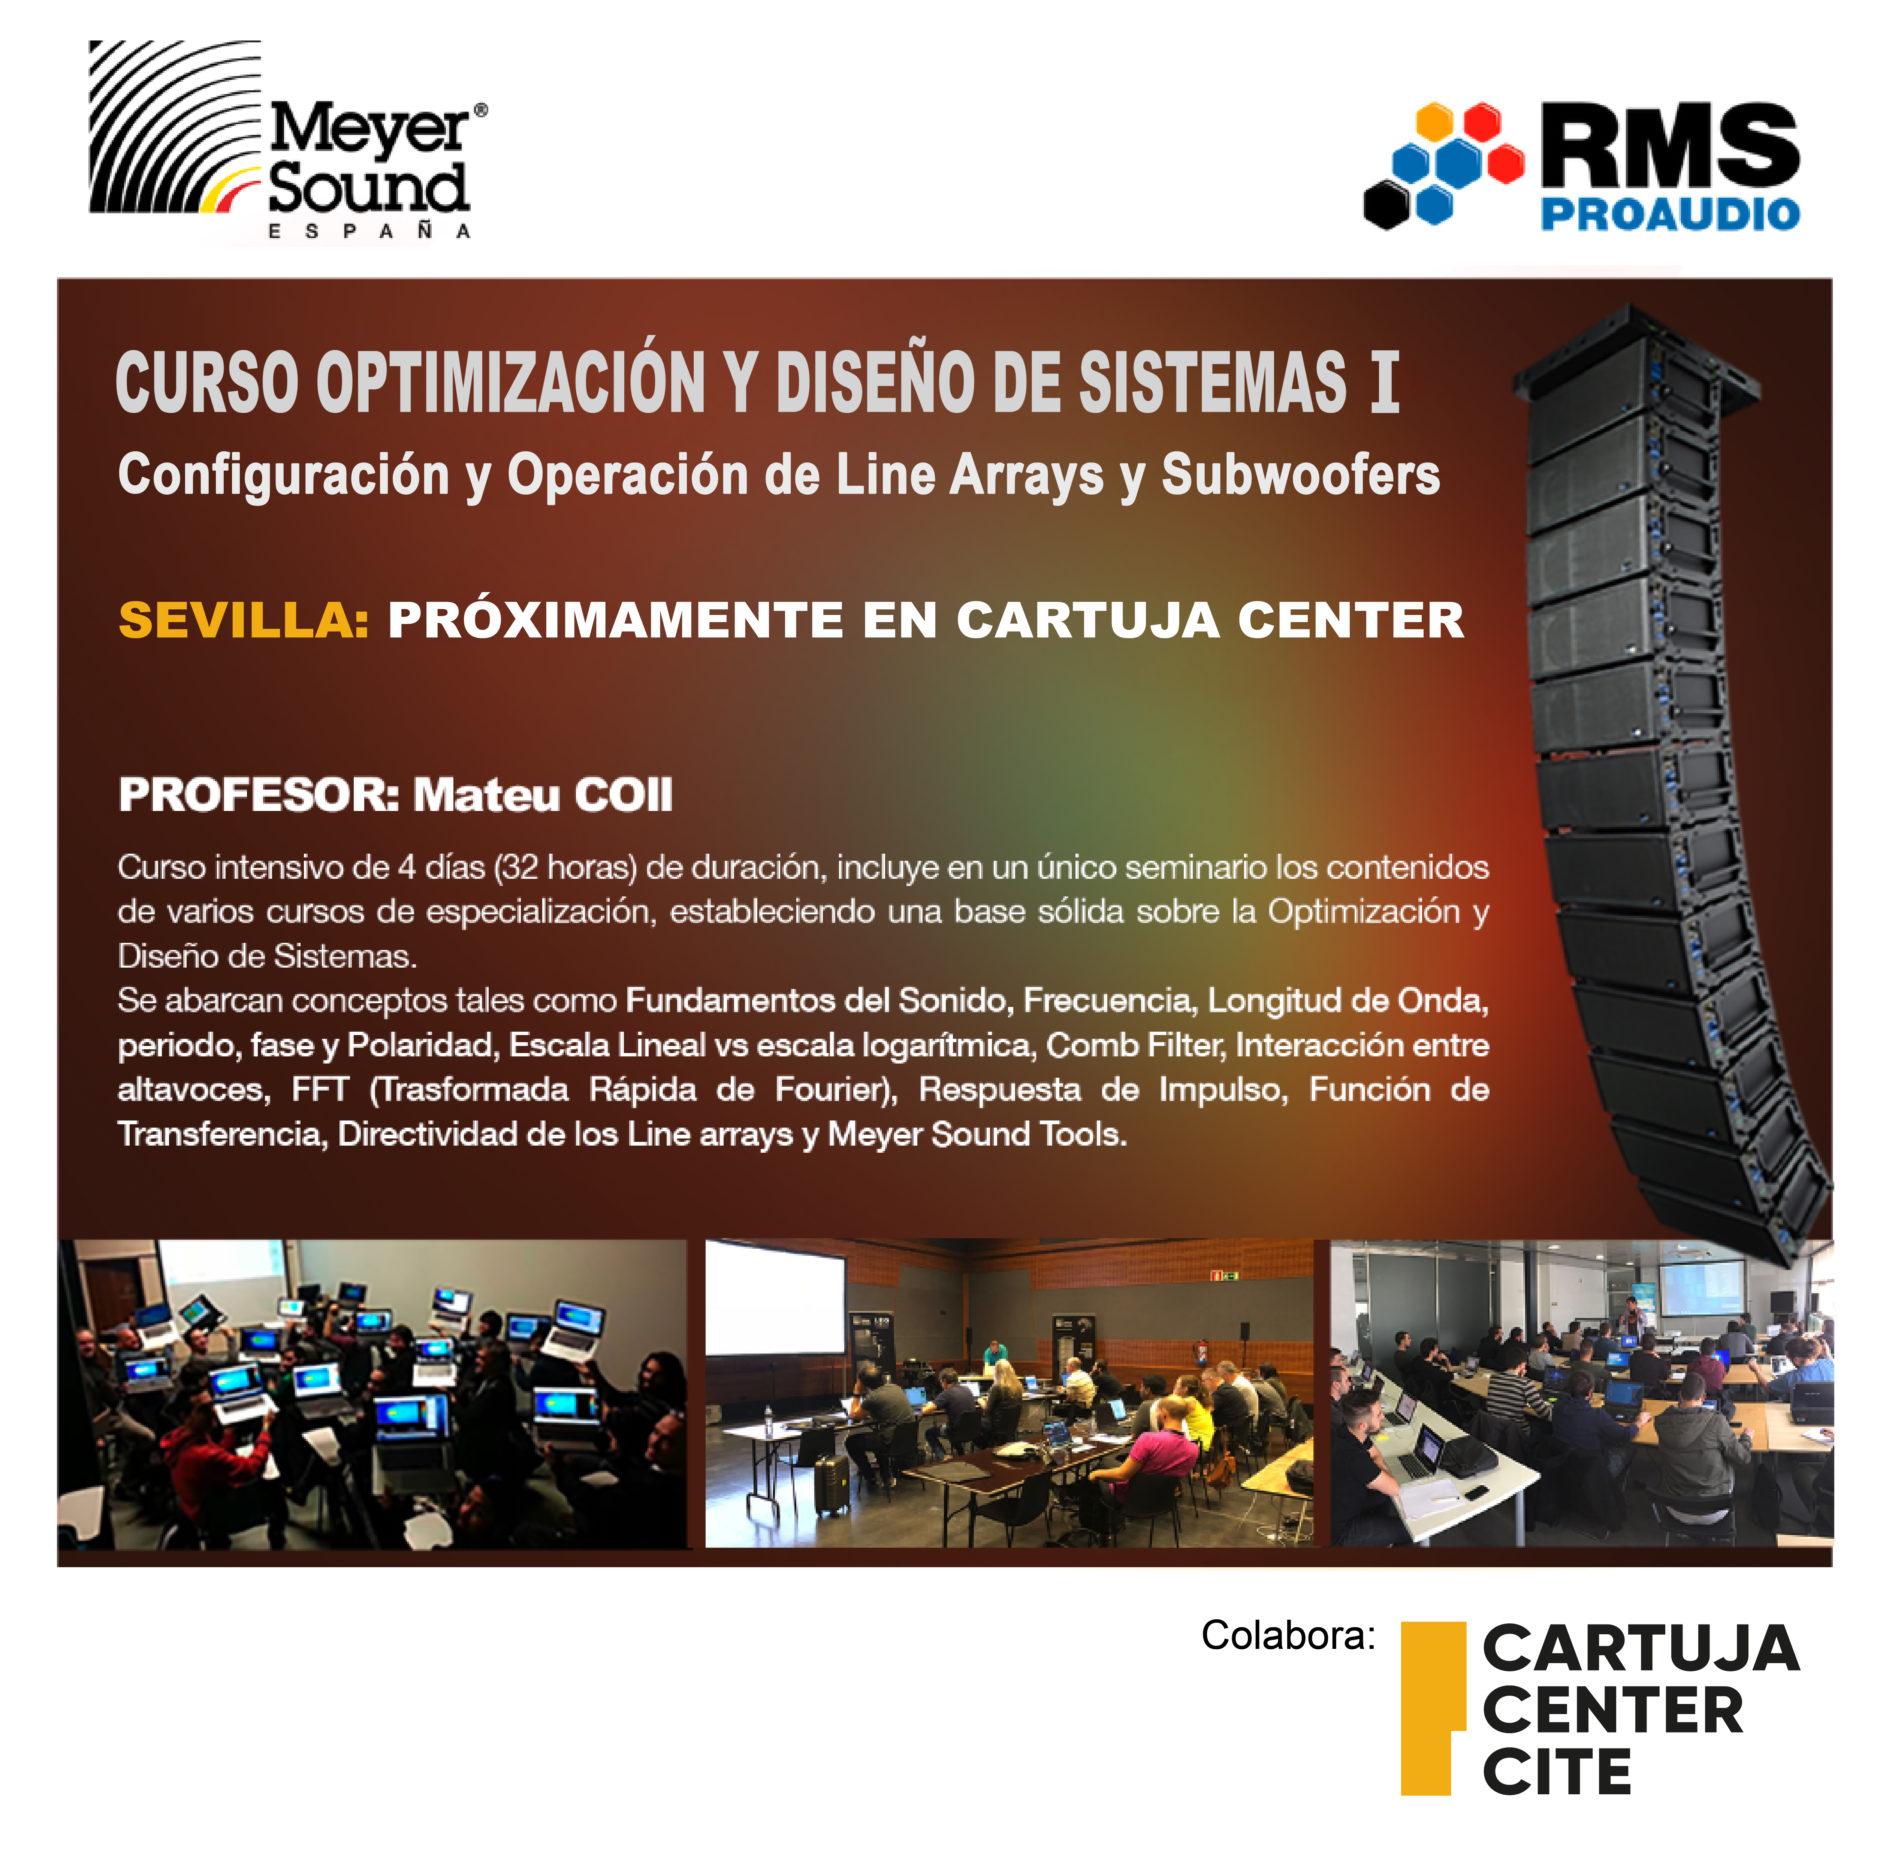 Cartuja Center Academy organiza cursos avanzados de sonido 1